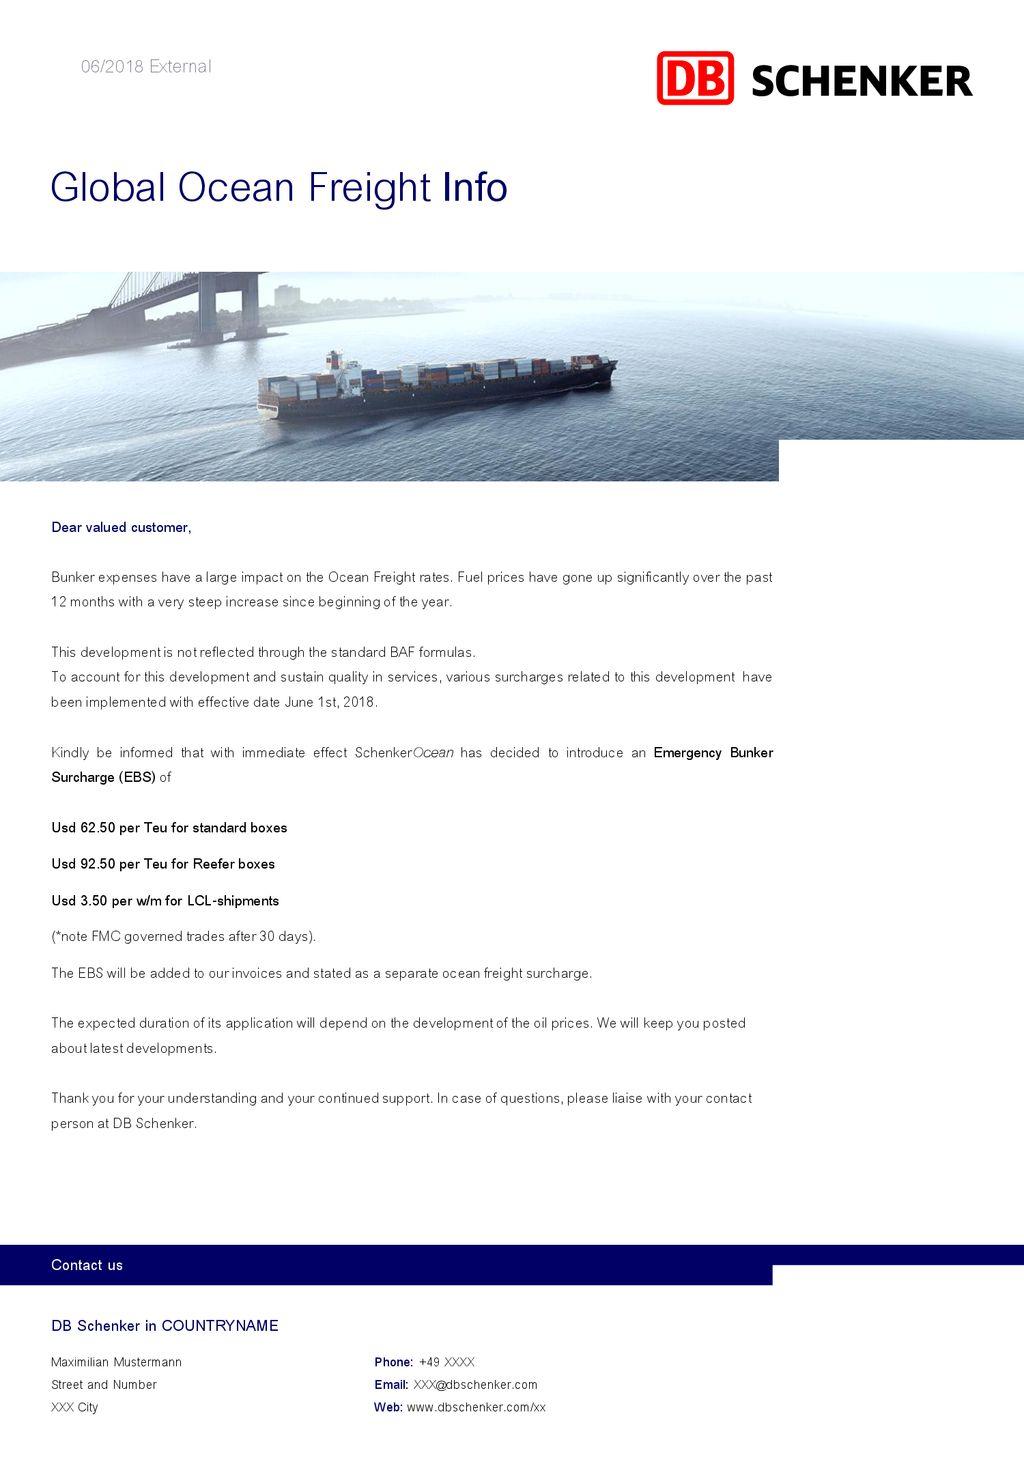 Global Ocean Freight Info - ppt download